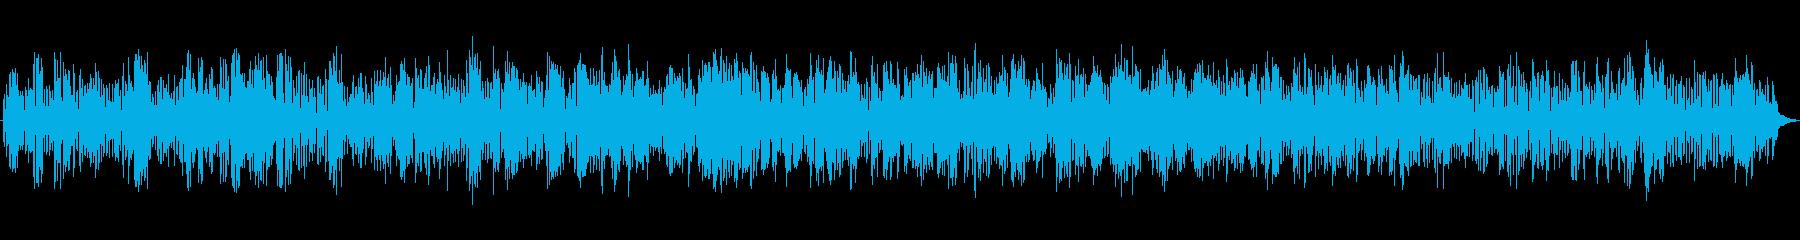 JAZZ|楽しい!を表現した明るいBGMの再生済みの波形